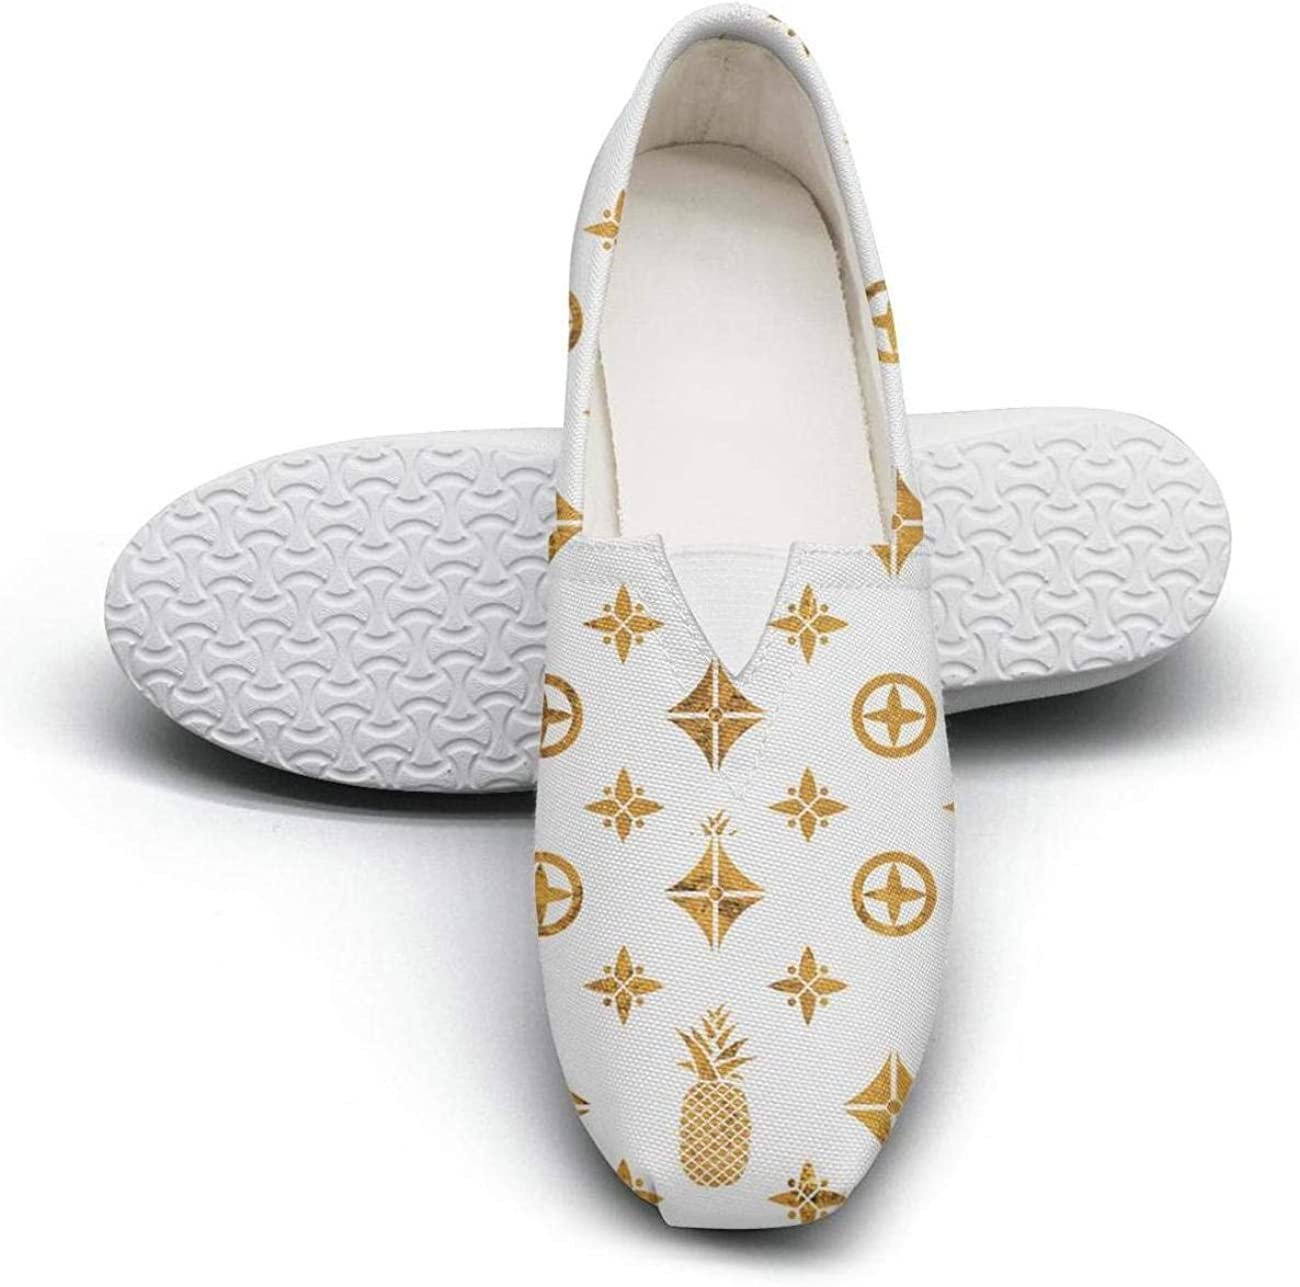 Shih Tzu Dog Silhouettes Balck and White Classic Slip-ONS Women's Extra Light Flat Slip on Shoes Ladies Espadrille Flats